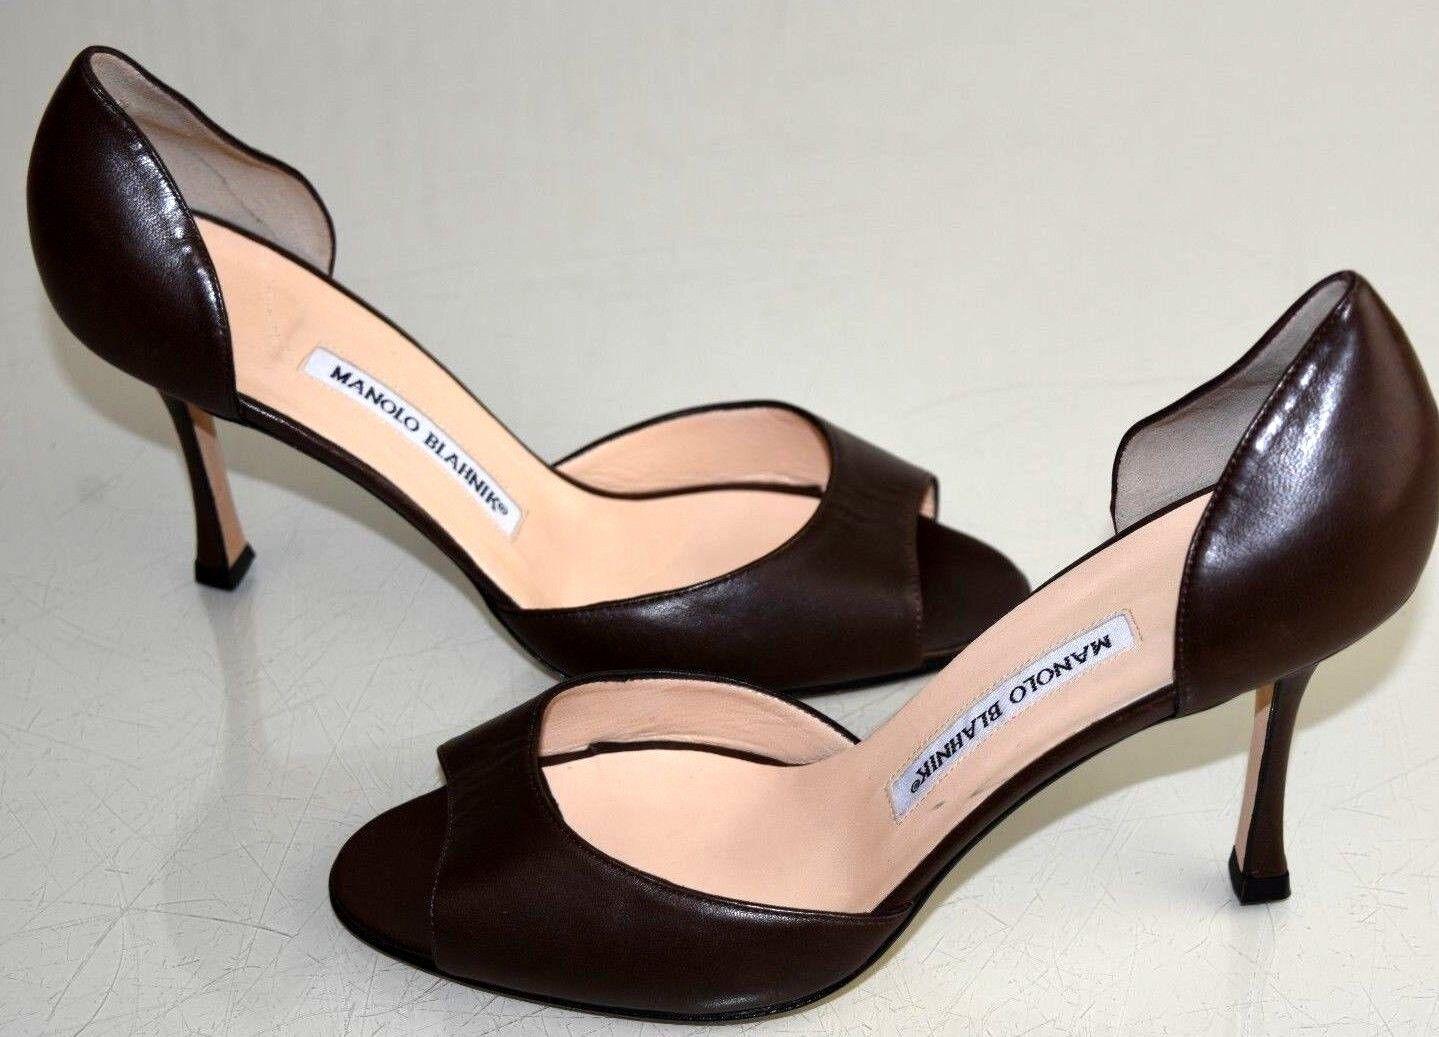 NEW Manolo Blahnik ASTUTADO Dorsay Pumps Chocolate Brown Leather Heel shoes 38.5